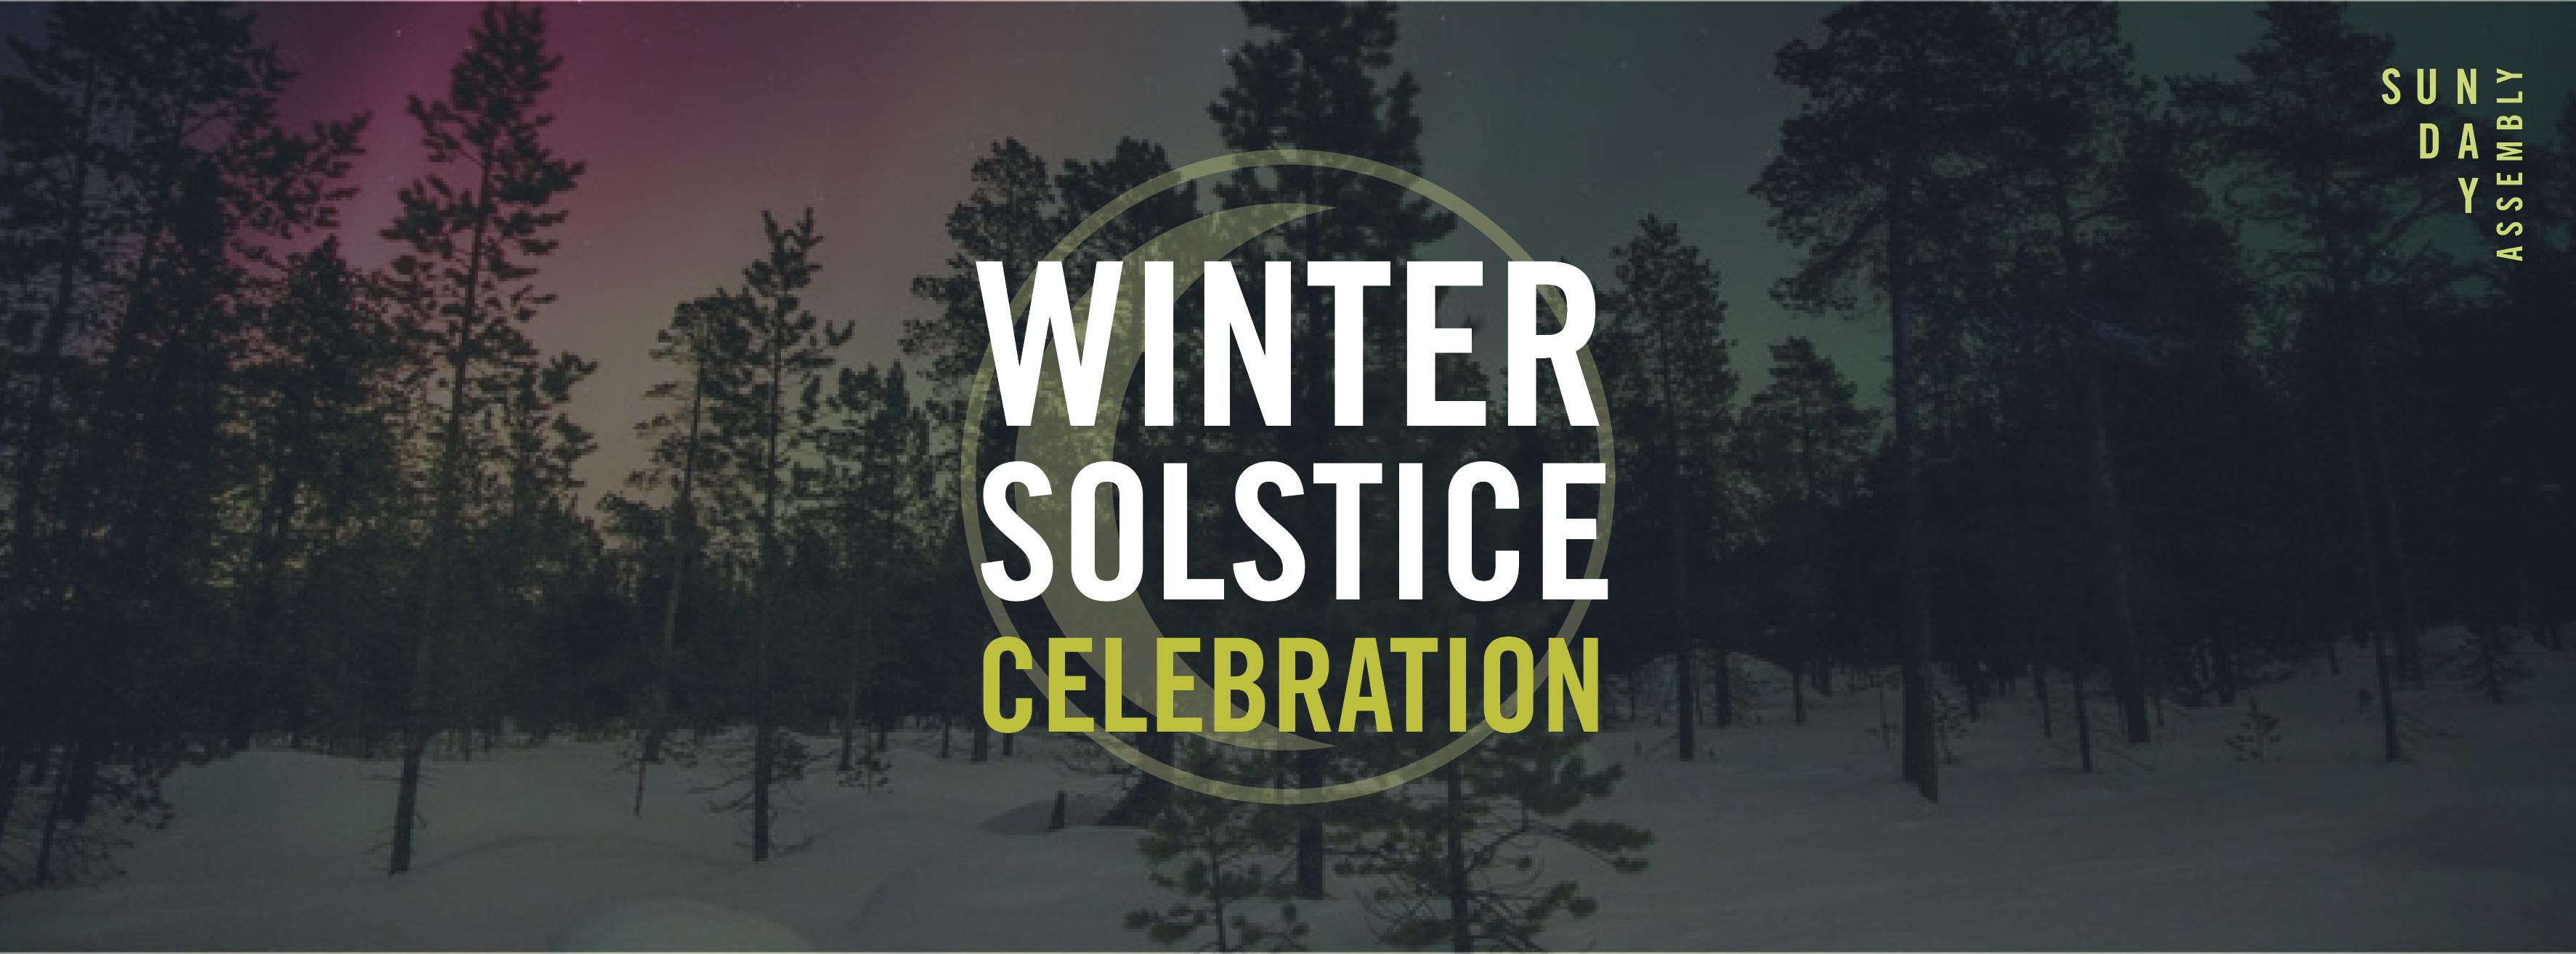 solstice2019_image.jpg